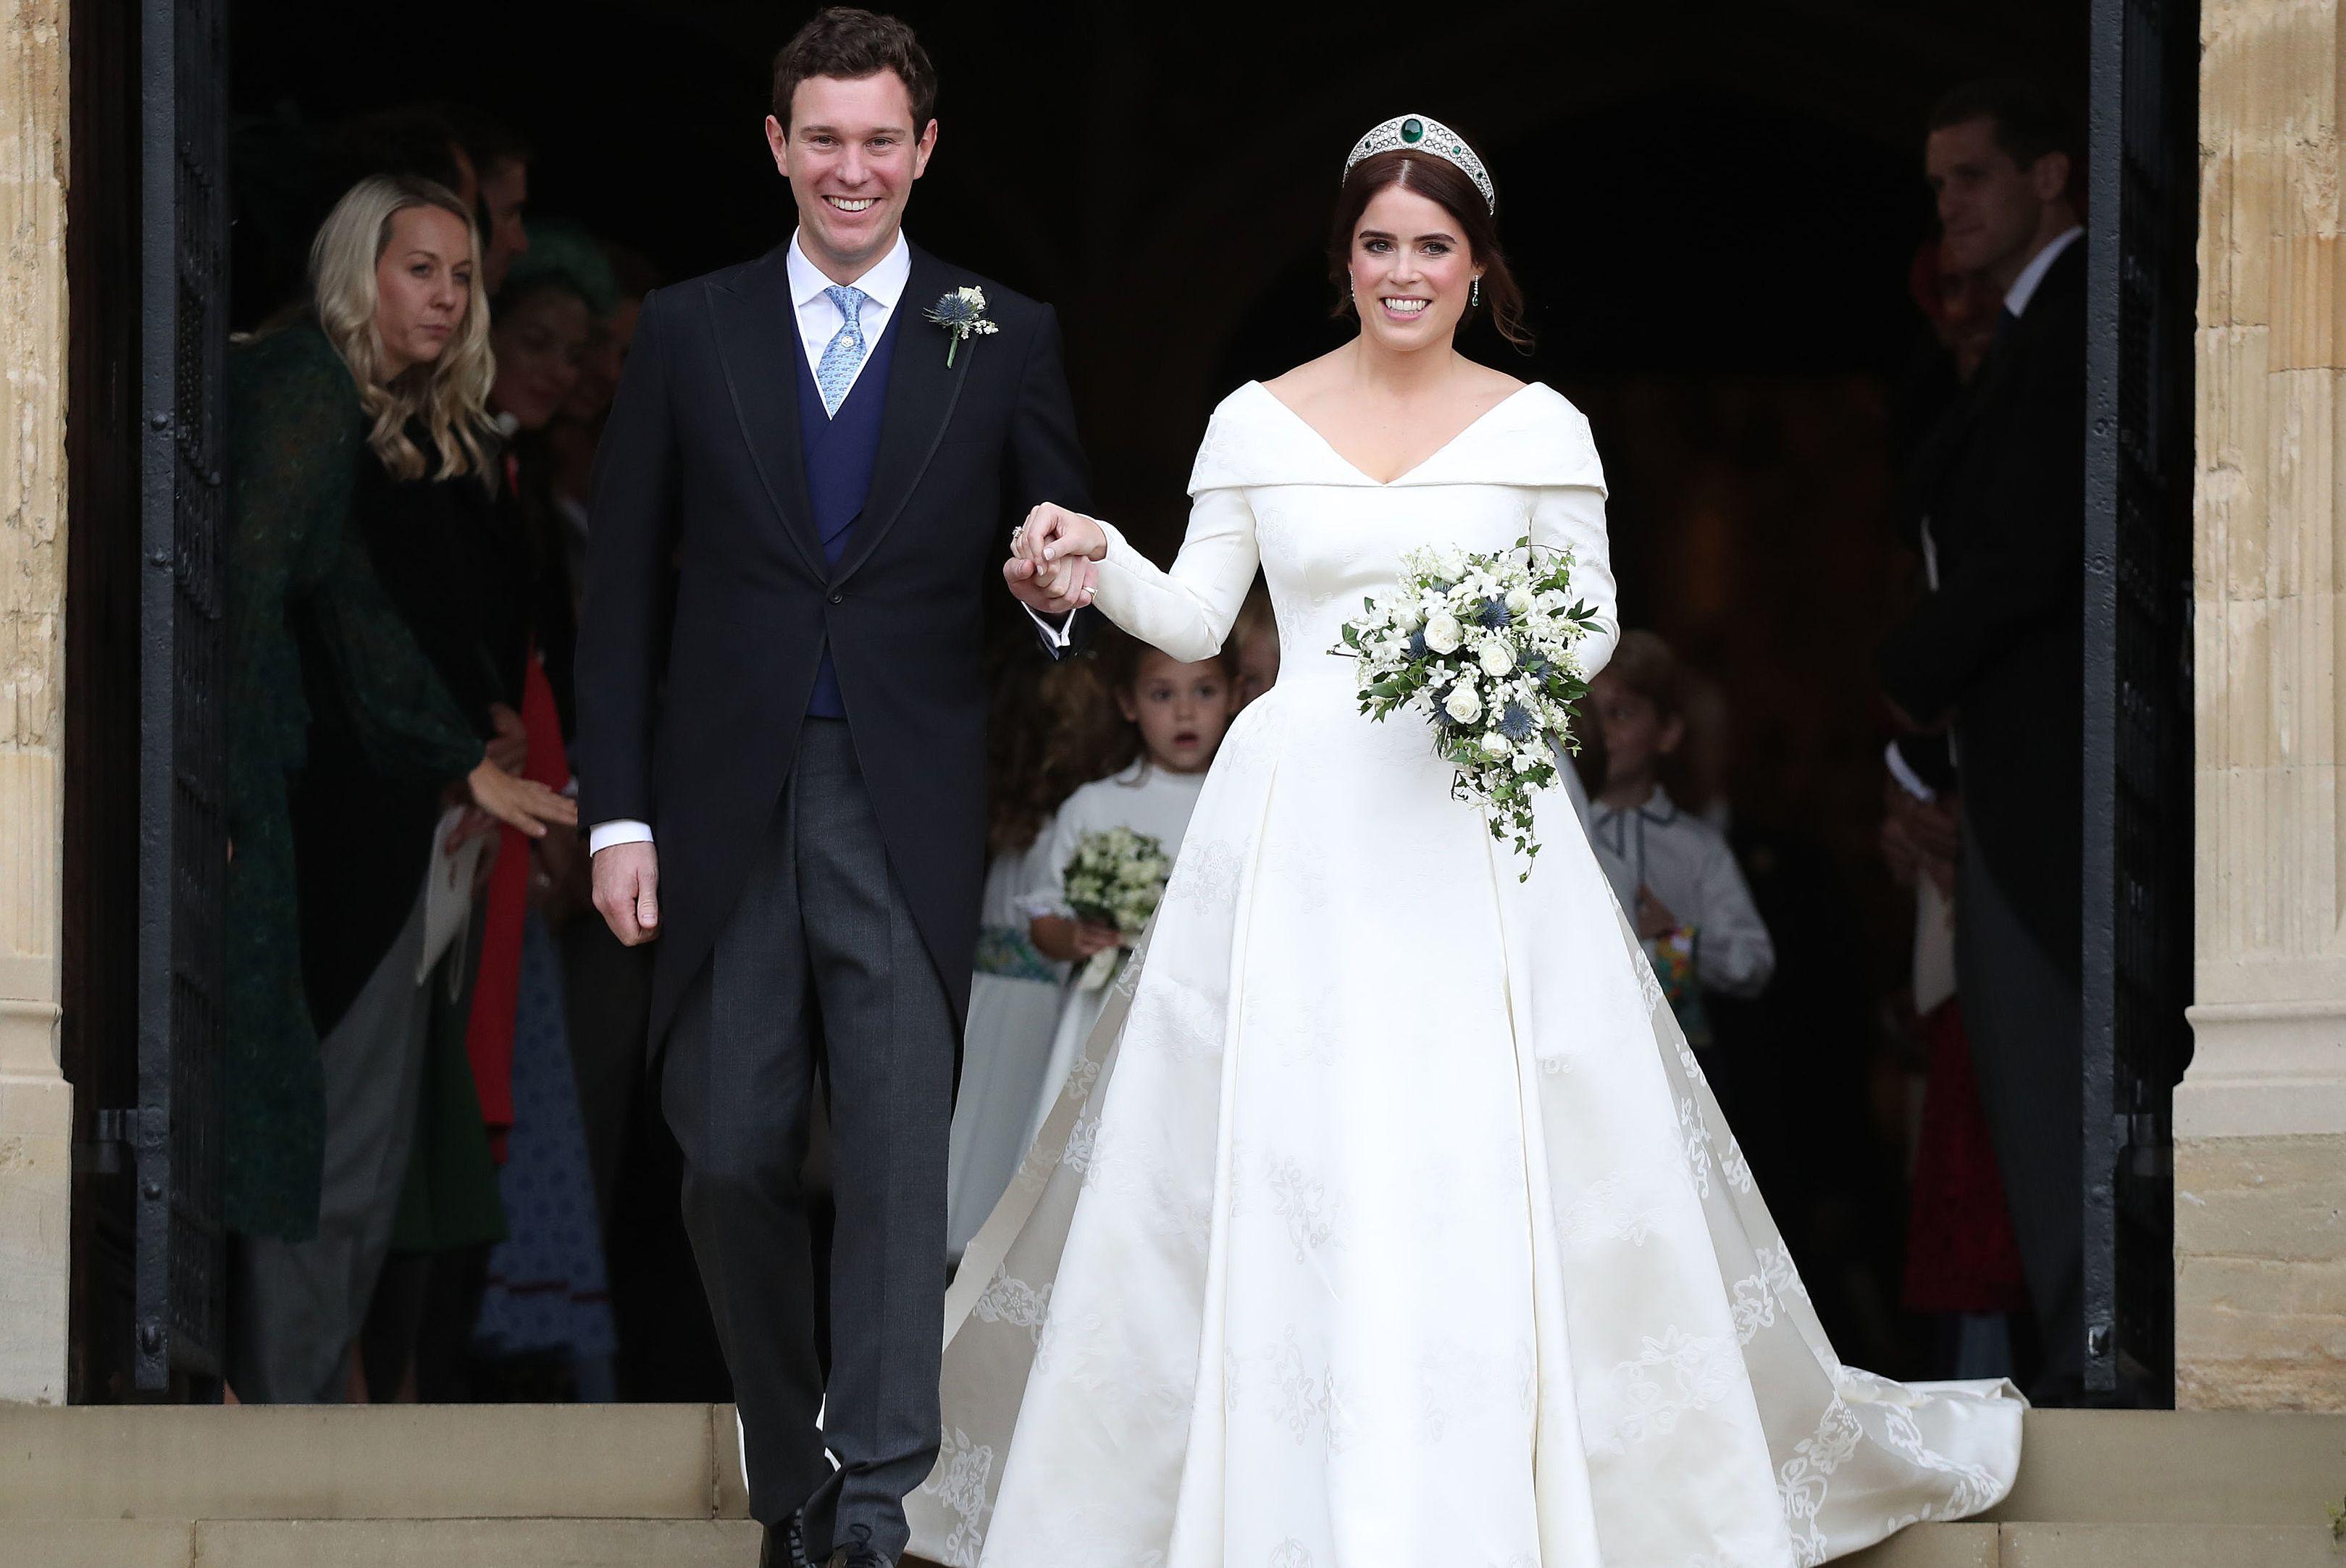 BRITAIN-ROYALS-WEDDING-EUGENIE-CEREMONY